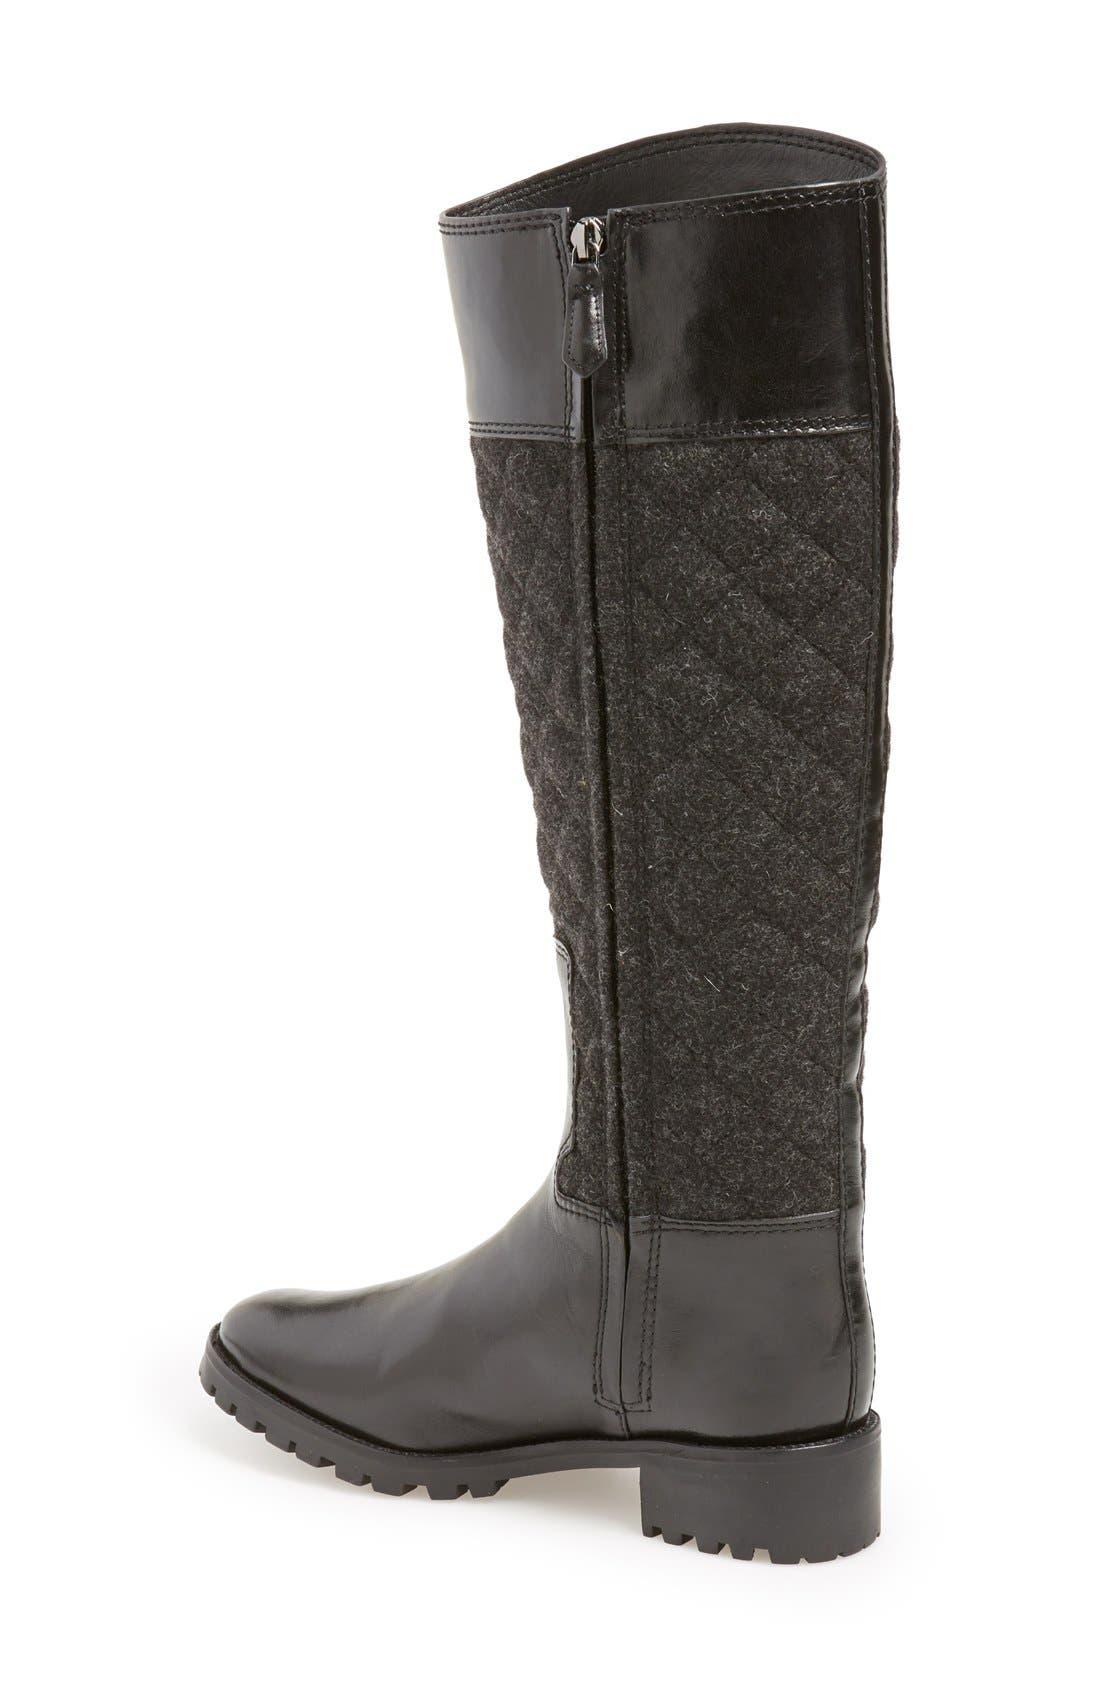 Alternate Image 2  - Tory Burch 'Melinda' Riding Boot (Women) (Nordstrom Exclusive)